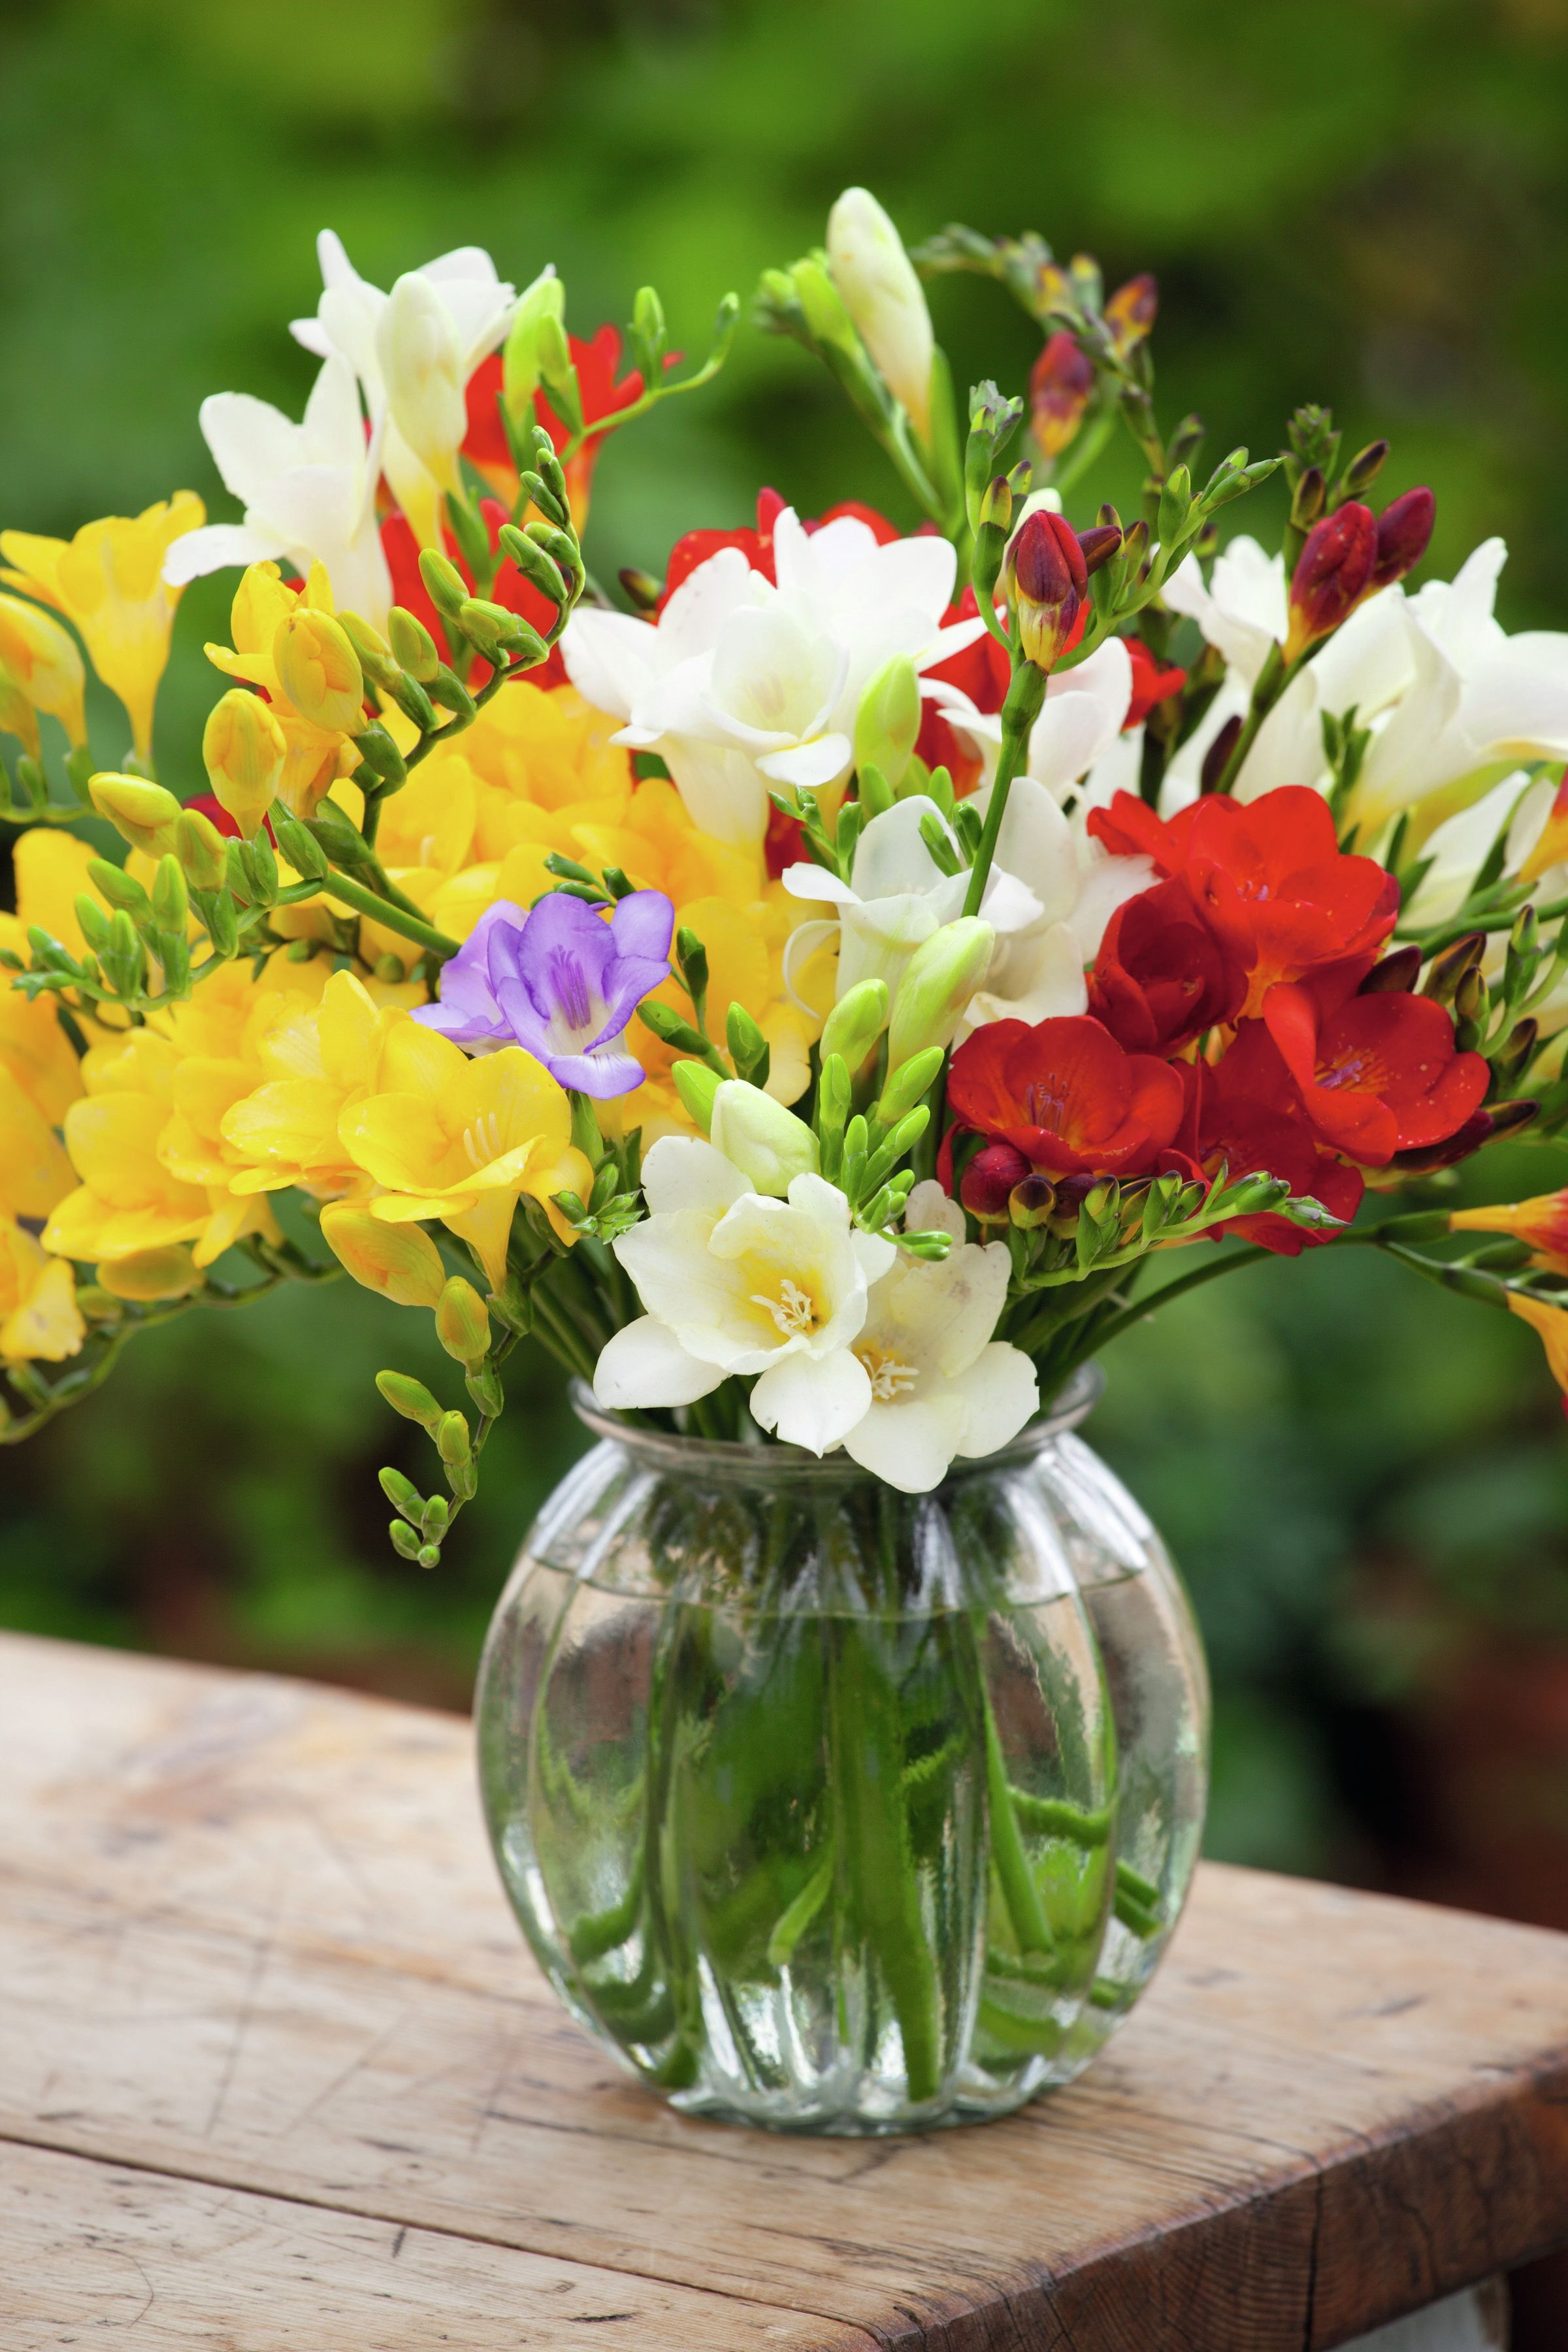 How To Plant And Grow Freesias Green Thumb Flowers Fresia Flower Freesia Flowers